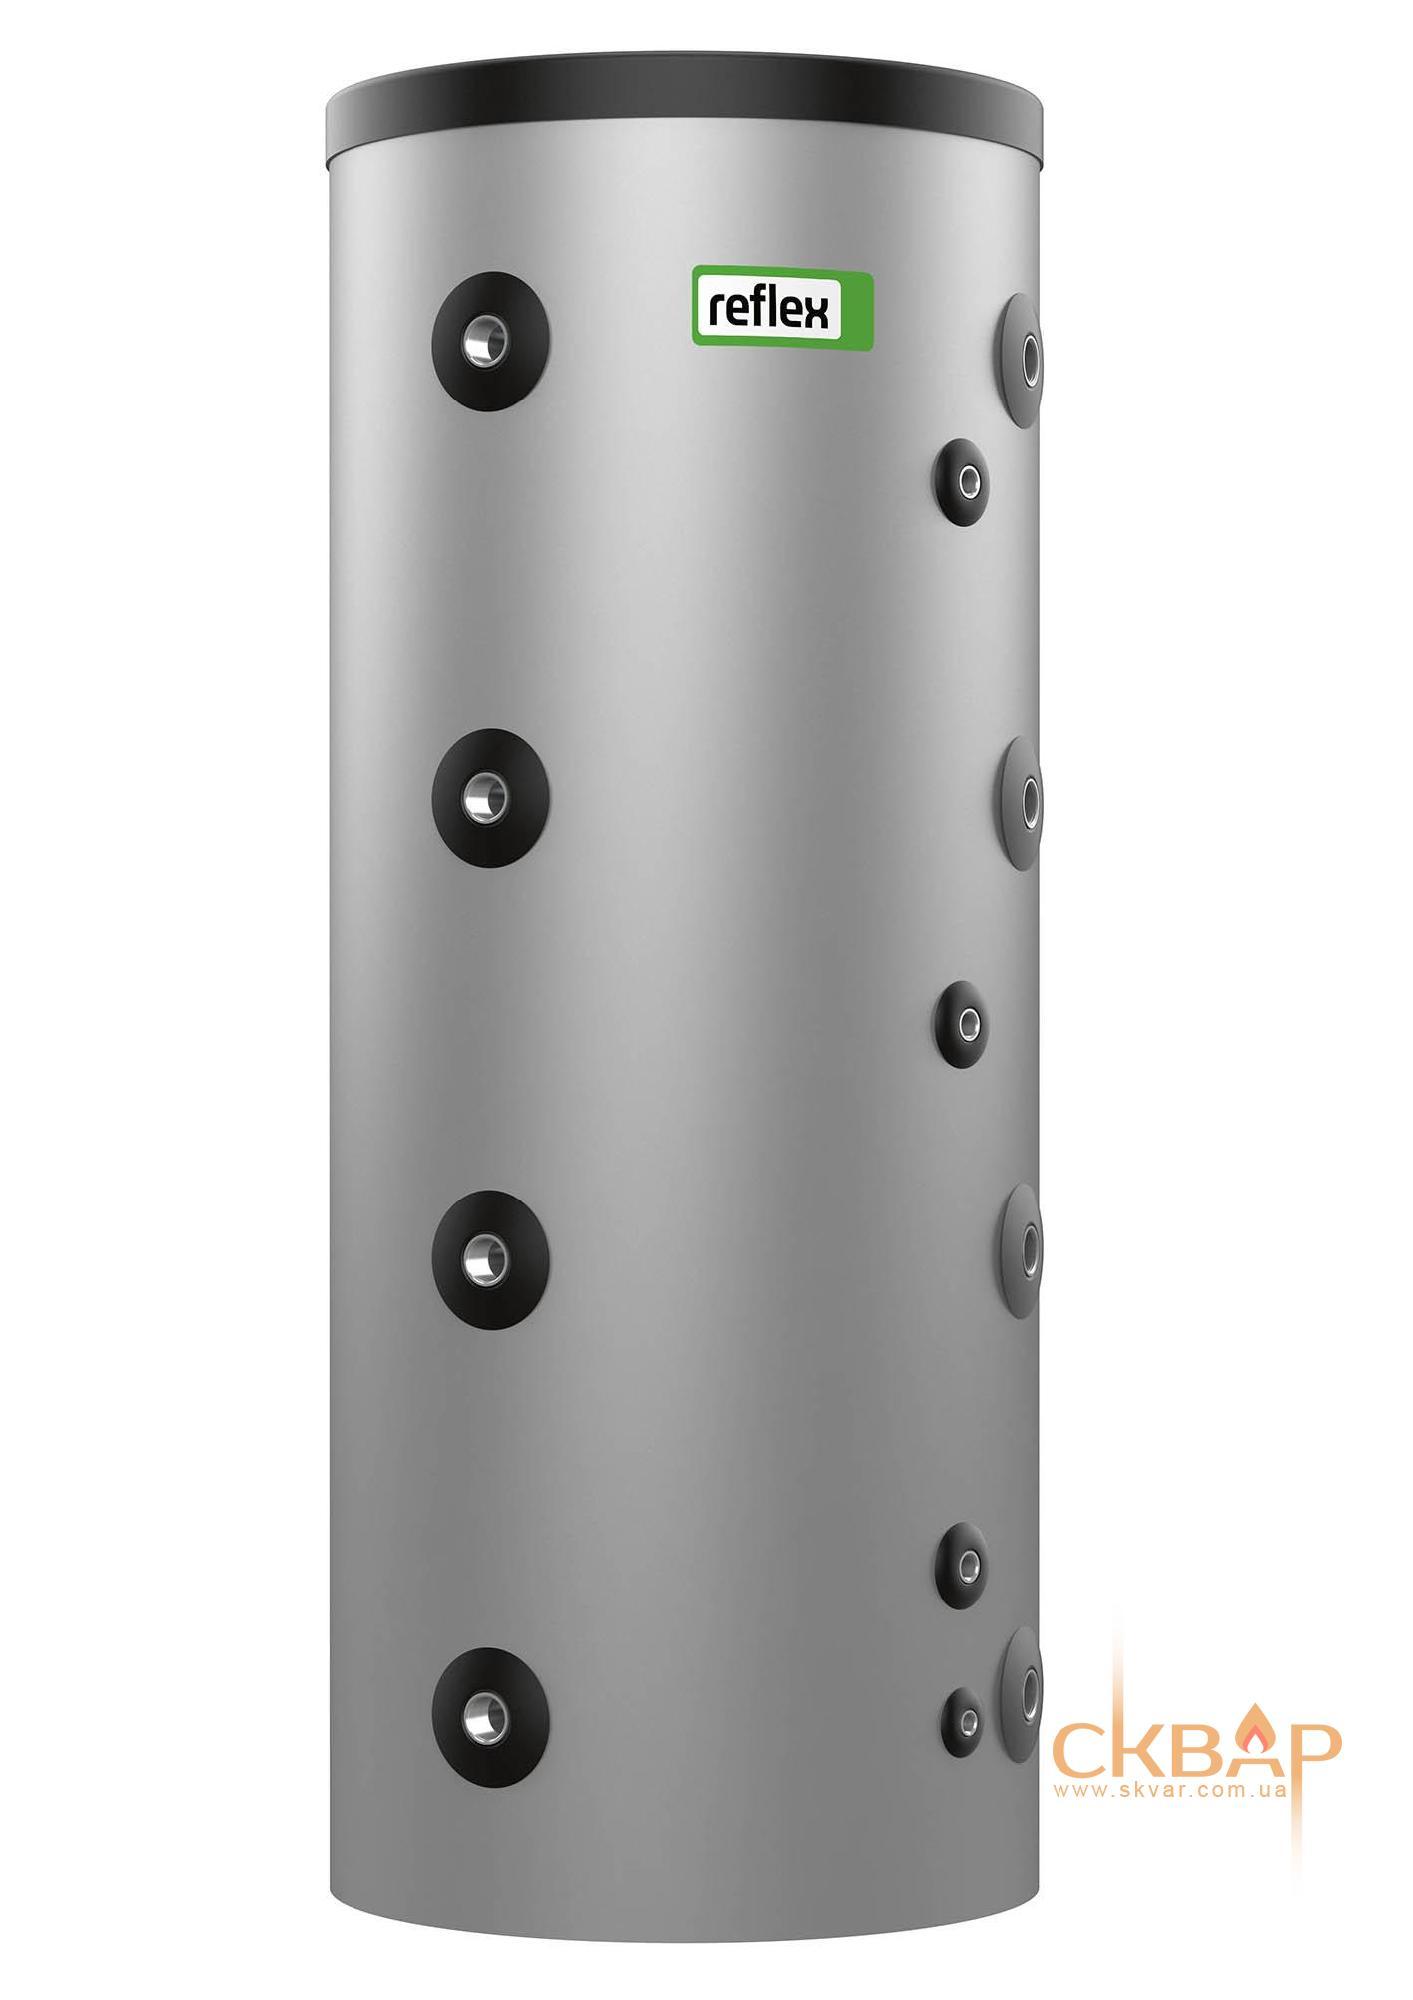 Reflex Storatherm Heat  HF 500 (8502020)